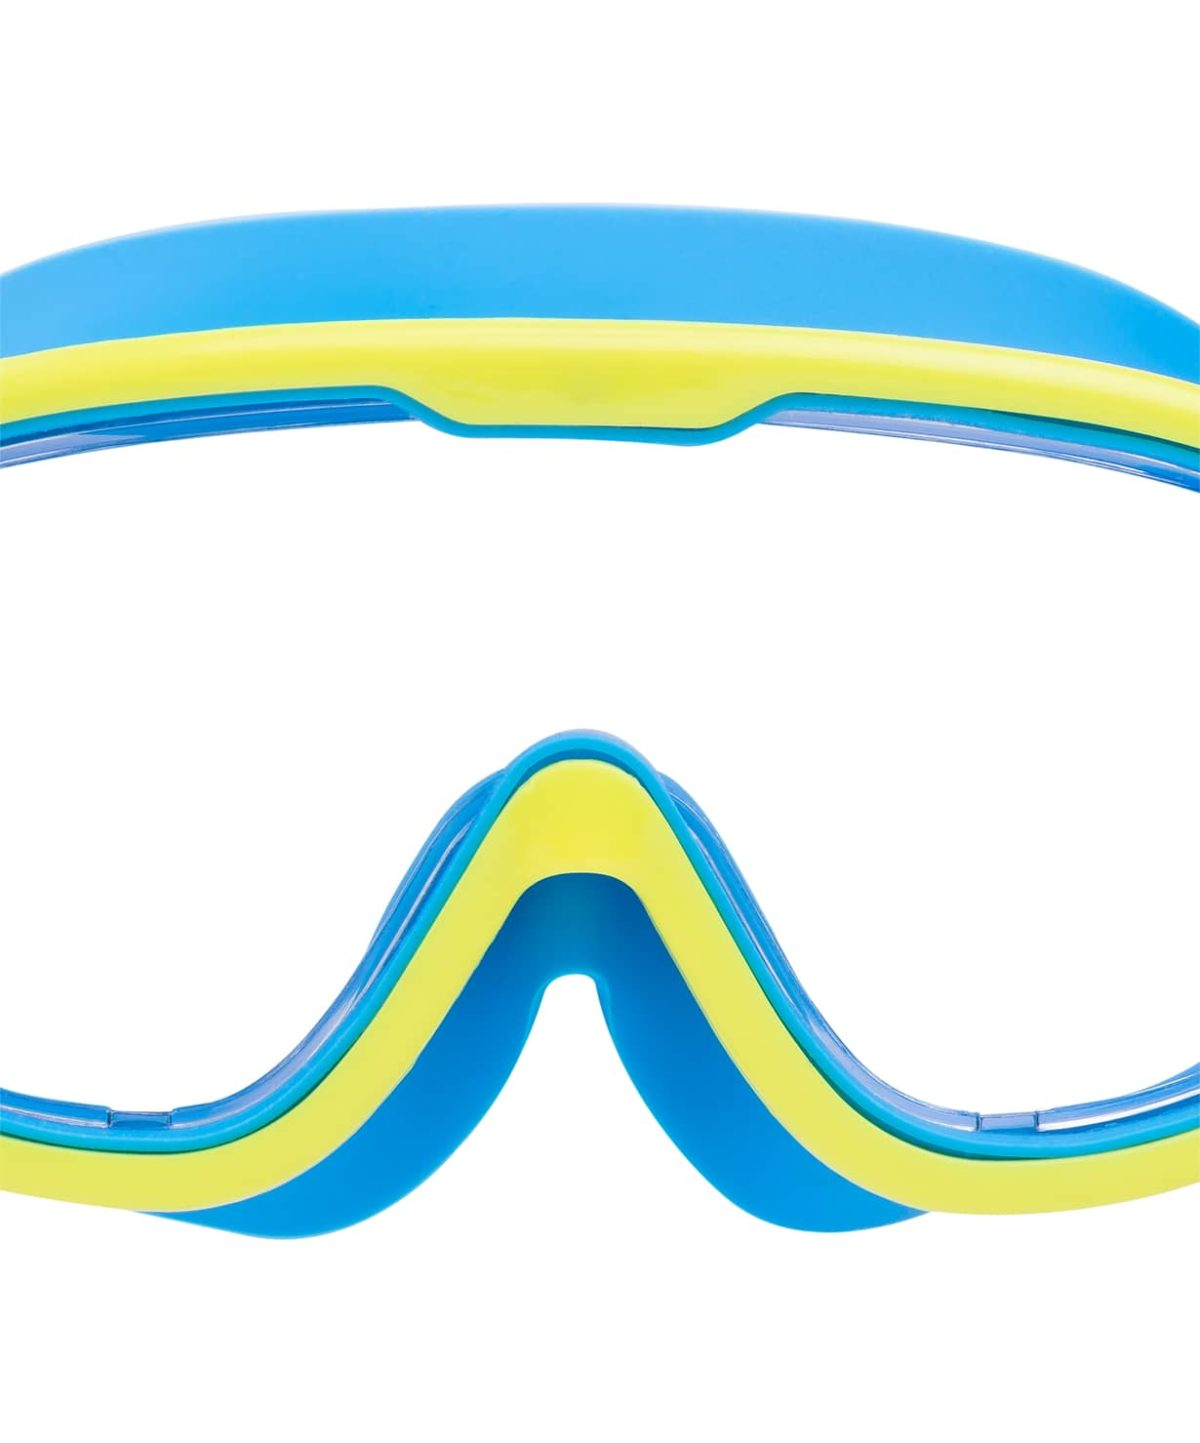 25DEGREES Очки-маска для плавания Hyper, детская  25D21018: голубой/лайм - 3